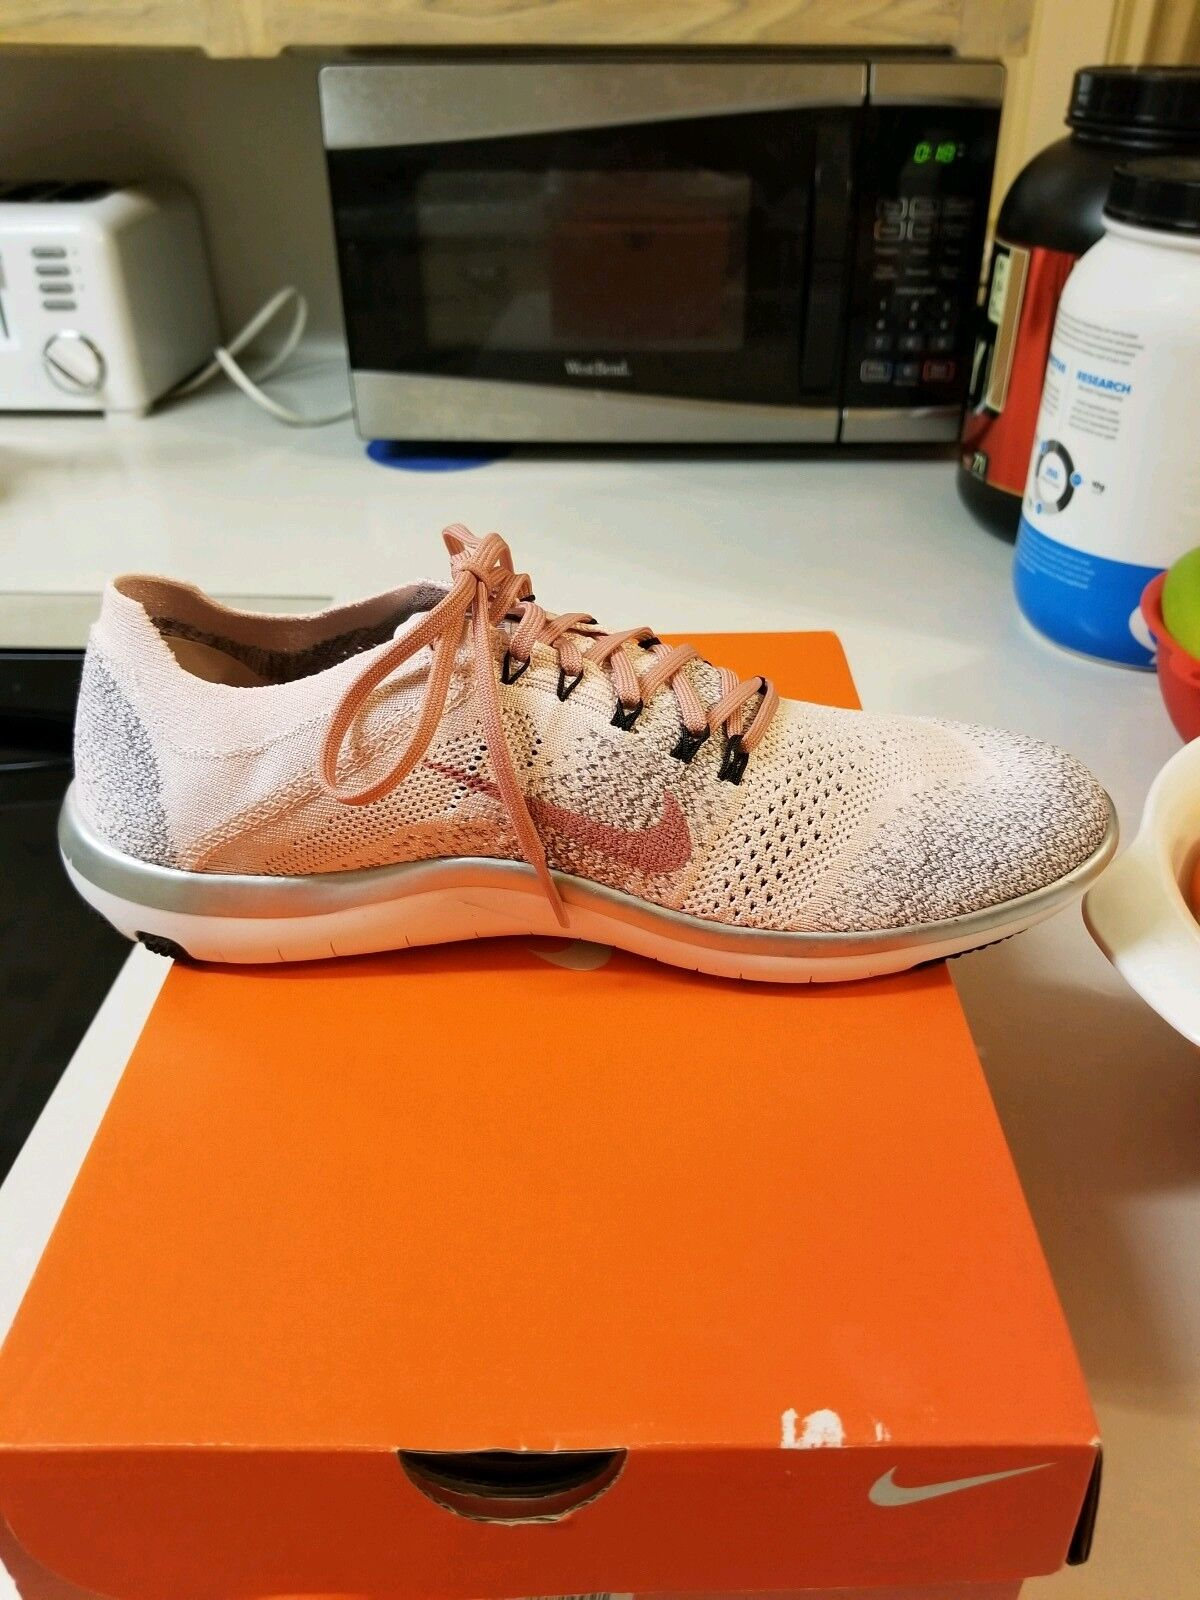 New Nike Free Flyknit Focus Focus Focus 2 Bionic Training Run shoes 11 bluesh Sunset Pink 449b67